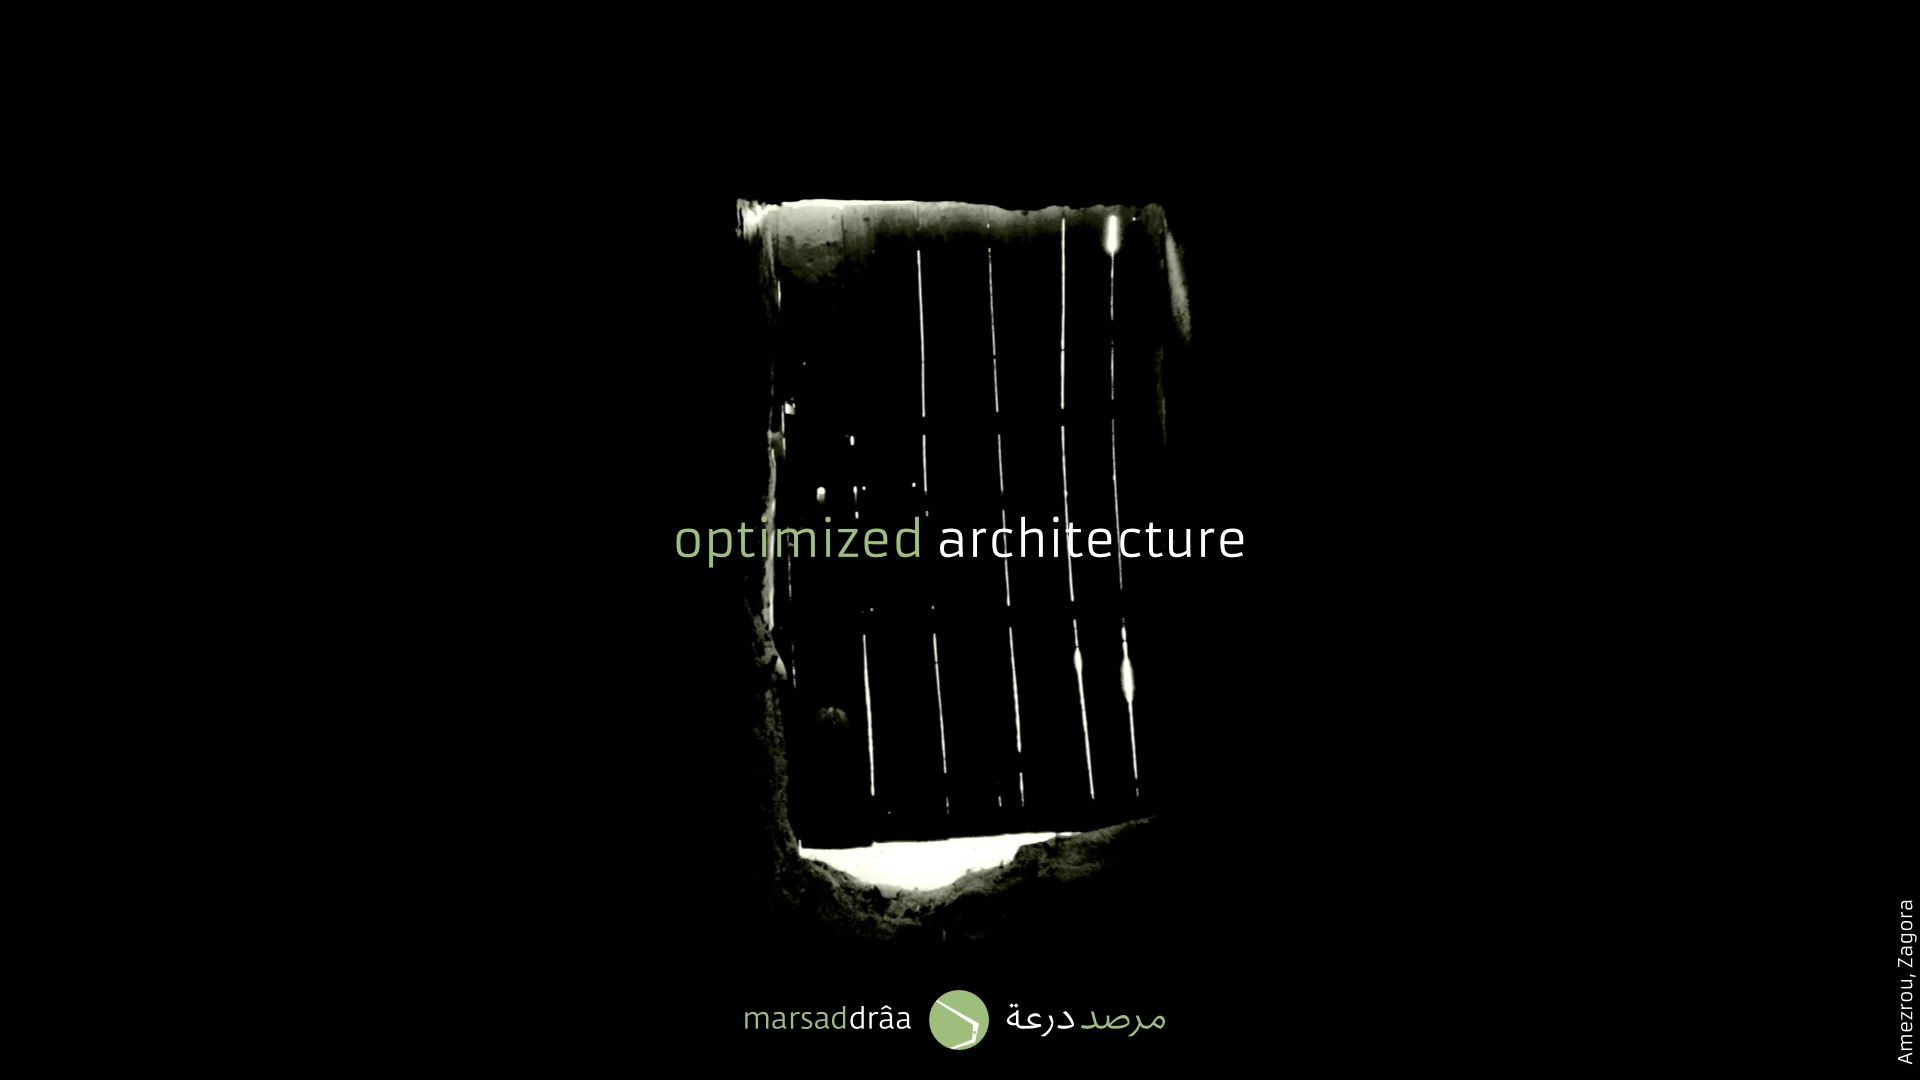 Where architecture is optimised to the maximum.